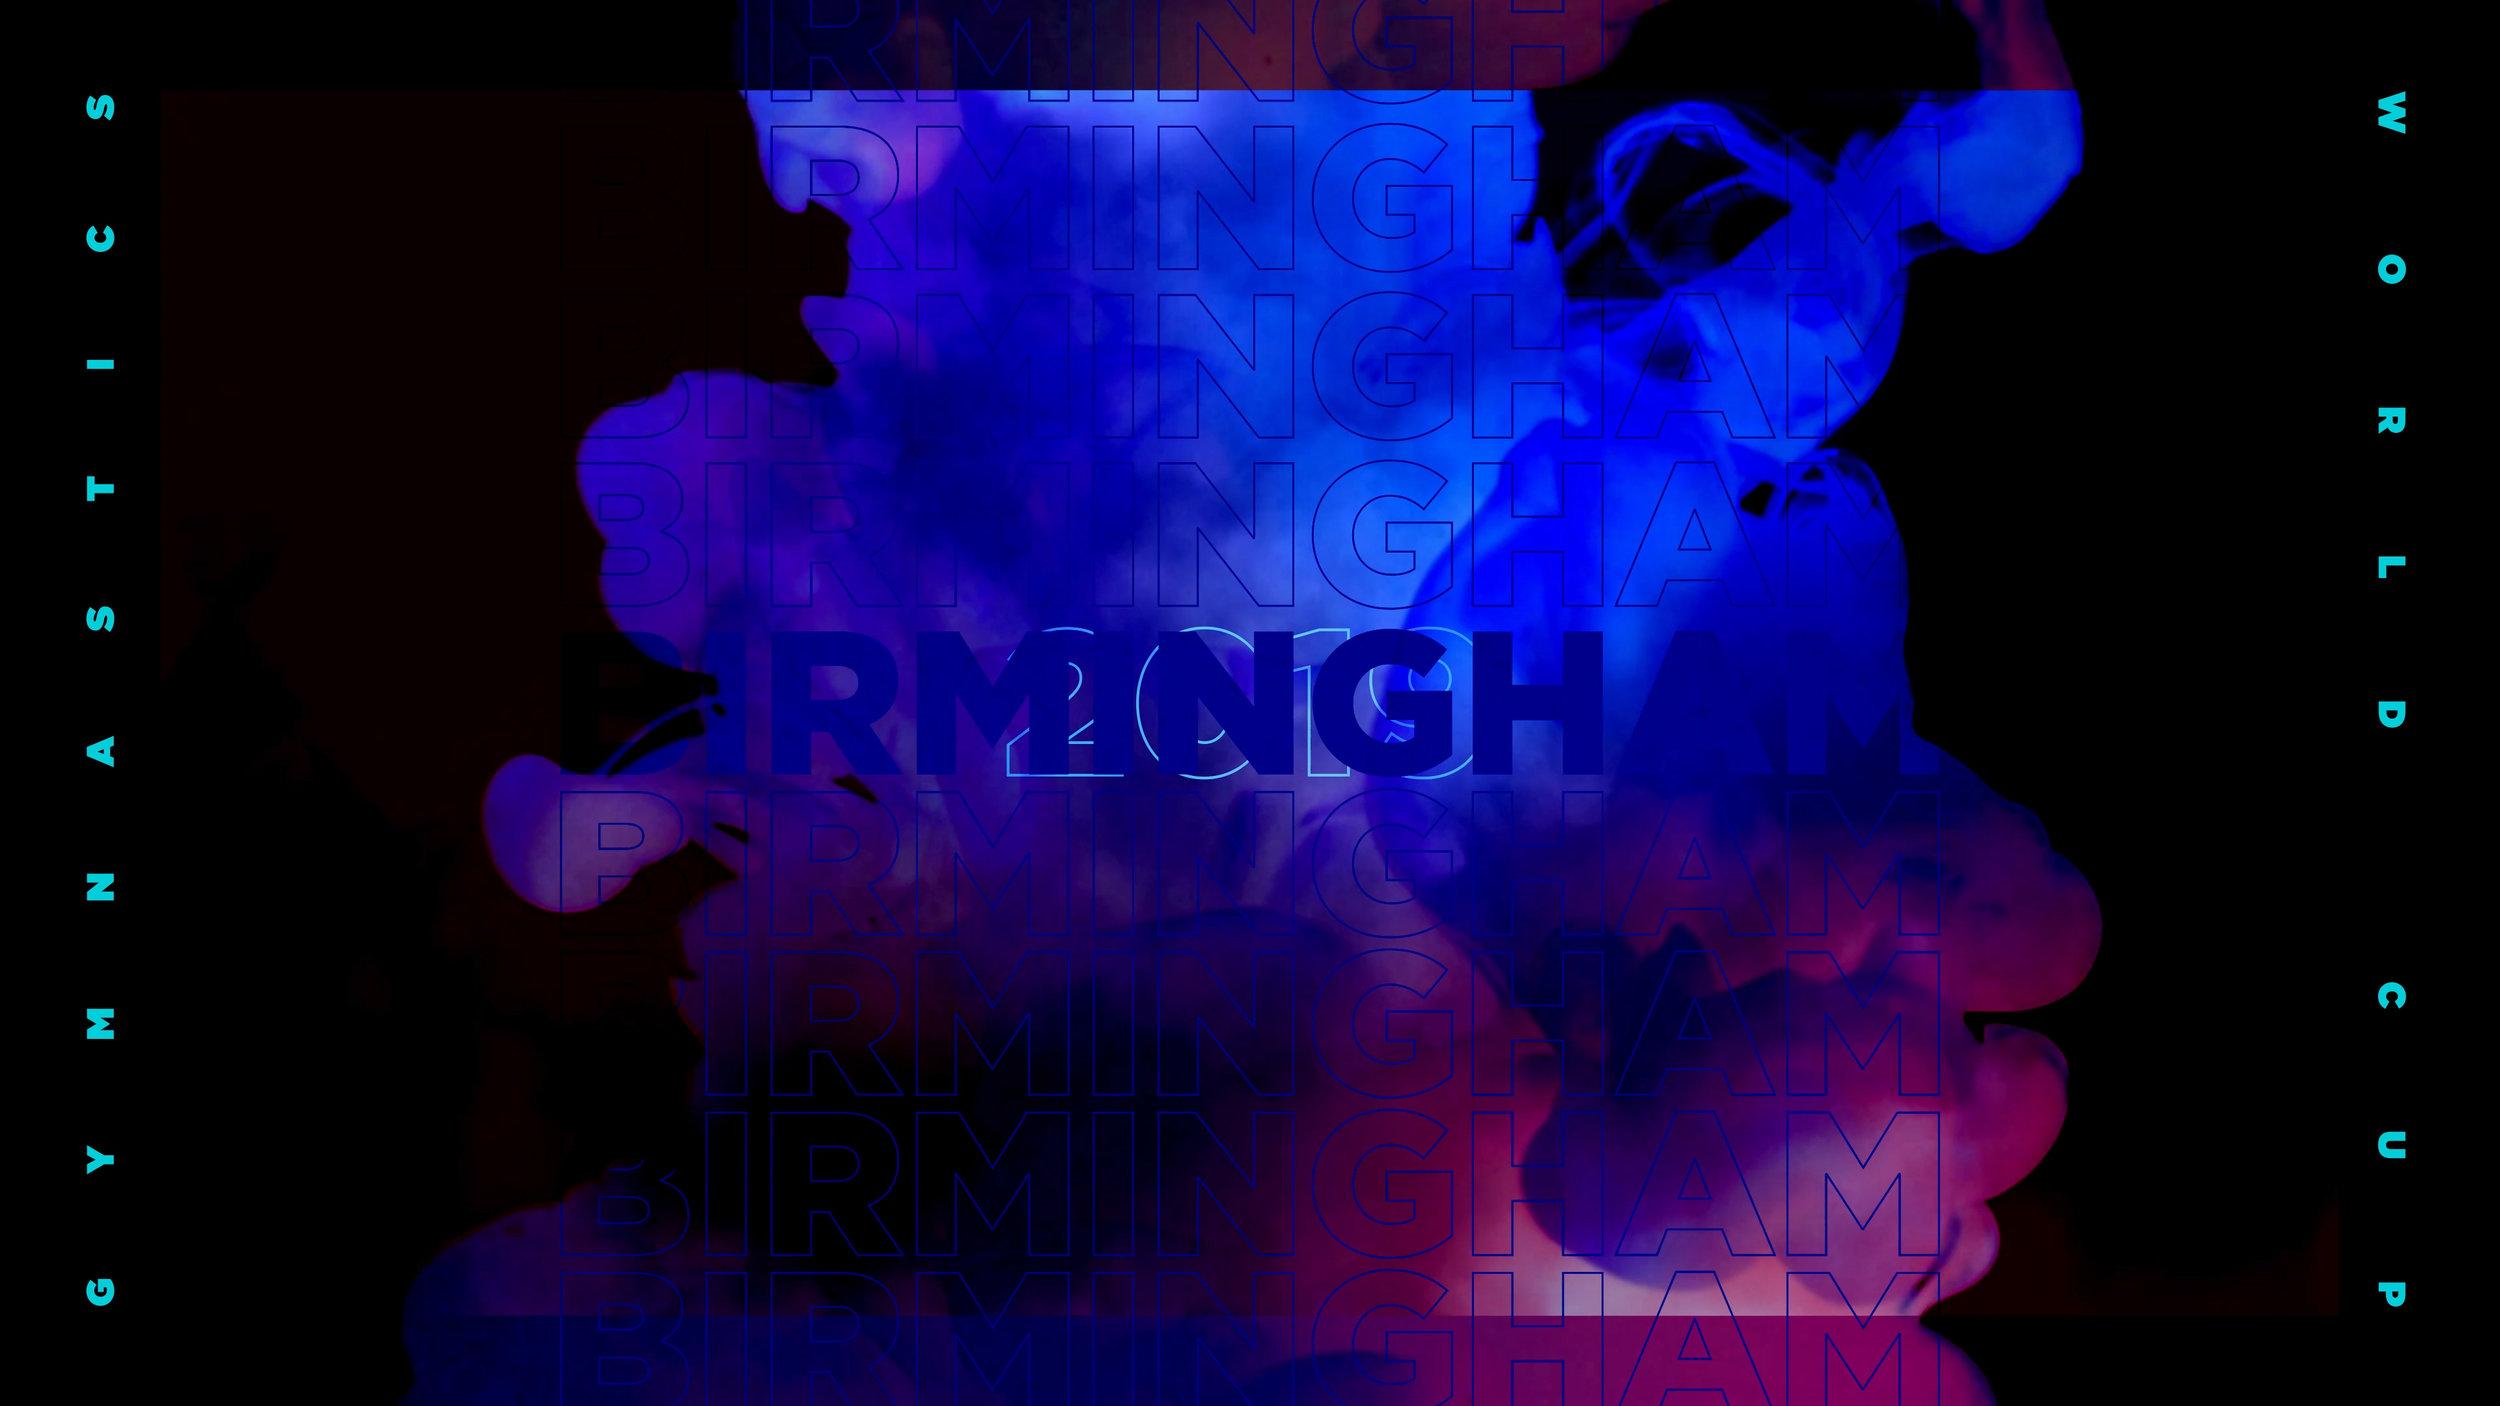 Irongiant-BritishGymnastics-MotionGraphics-1.jpg